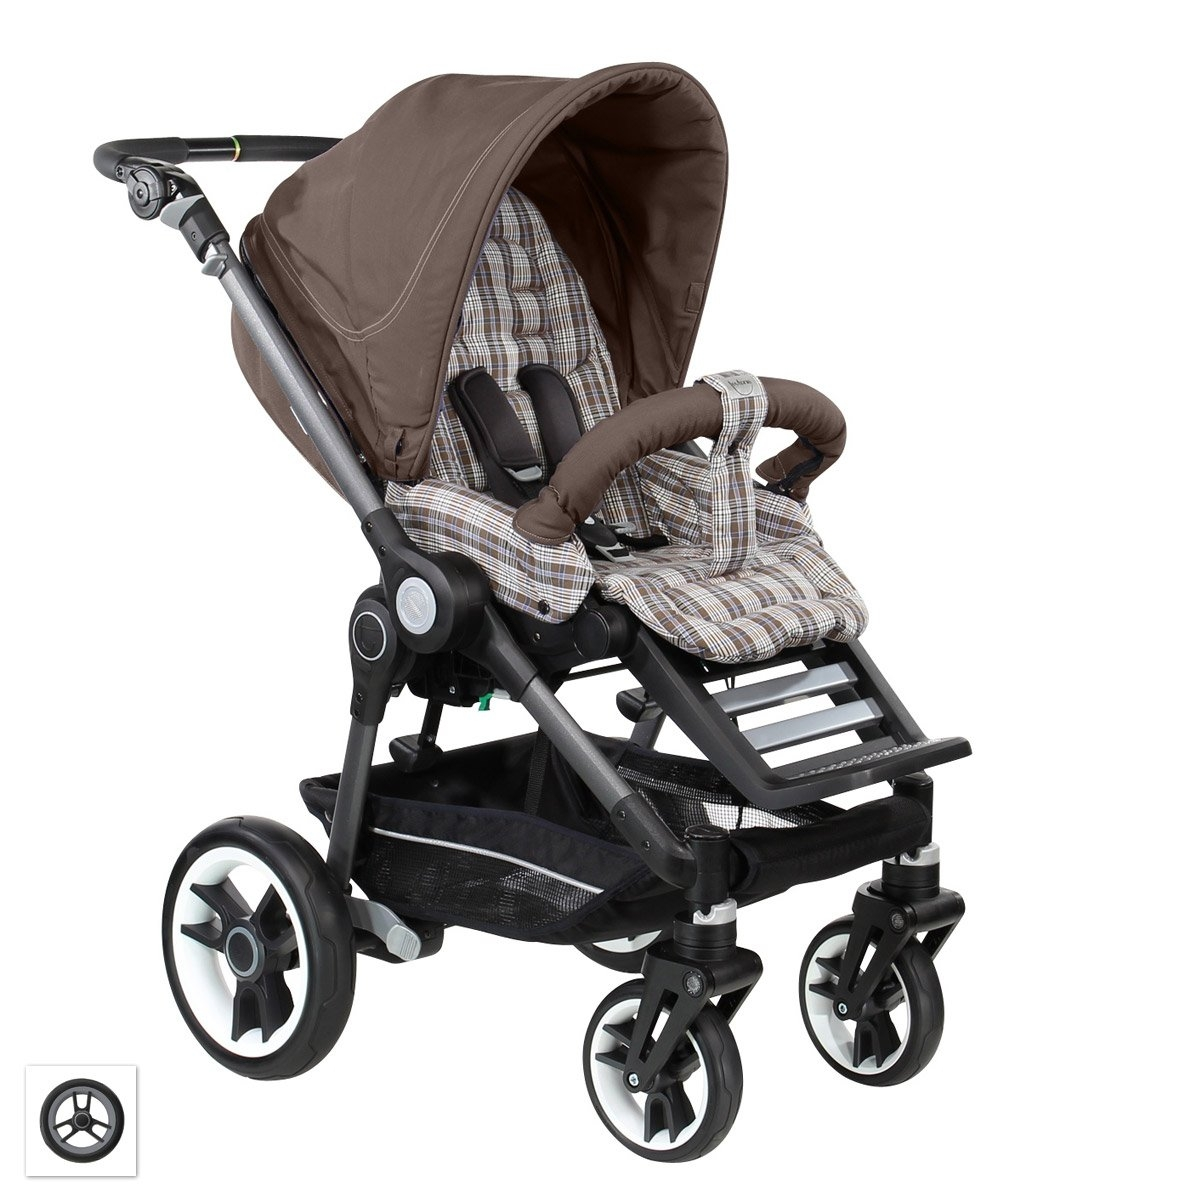 teutonia beyou v3 graphite rad 3 kinderwagen sportwagen 2015 farbwahl ebay. Black Bedroom Furniture Sets. Home Design Ideas